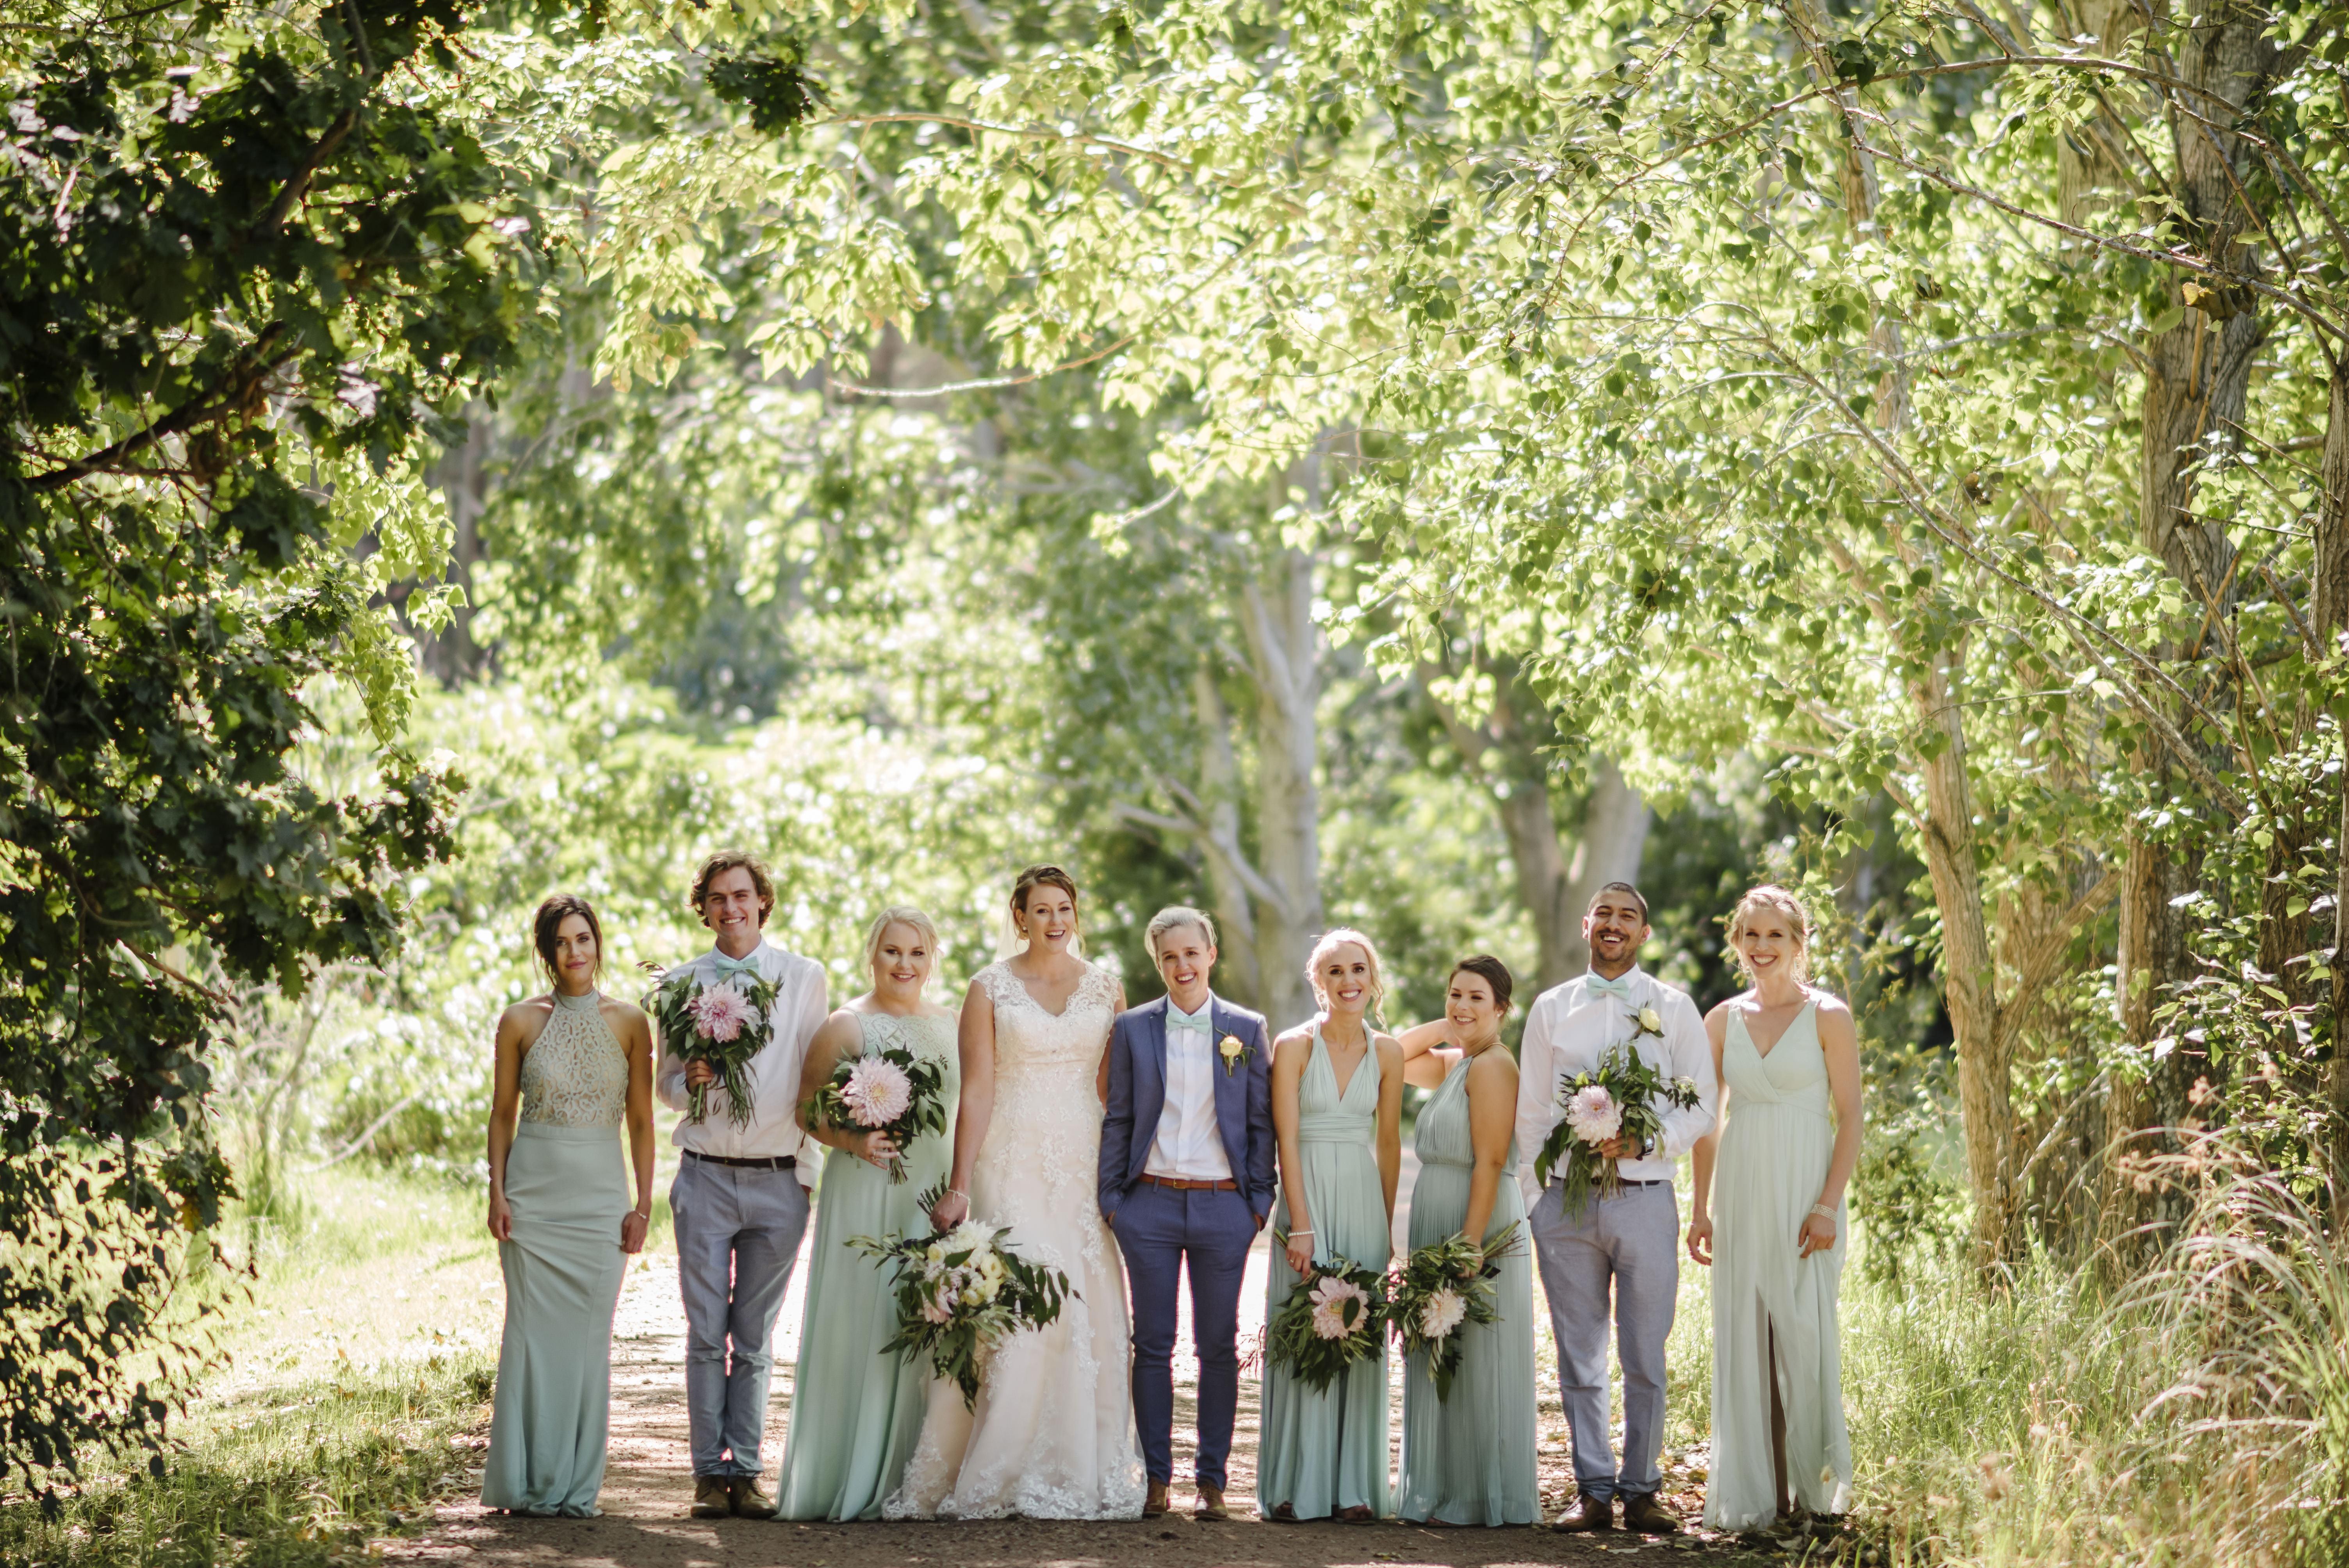 Amanda-Tash-the-official-photographers-wedding__TOP6668